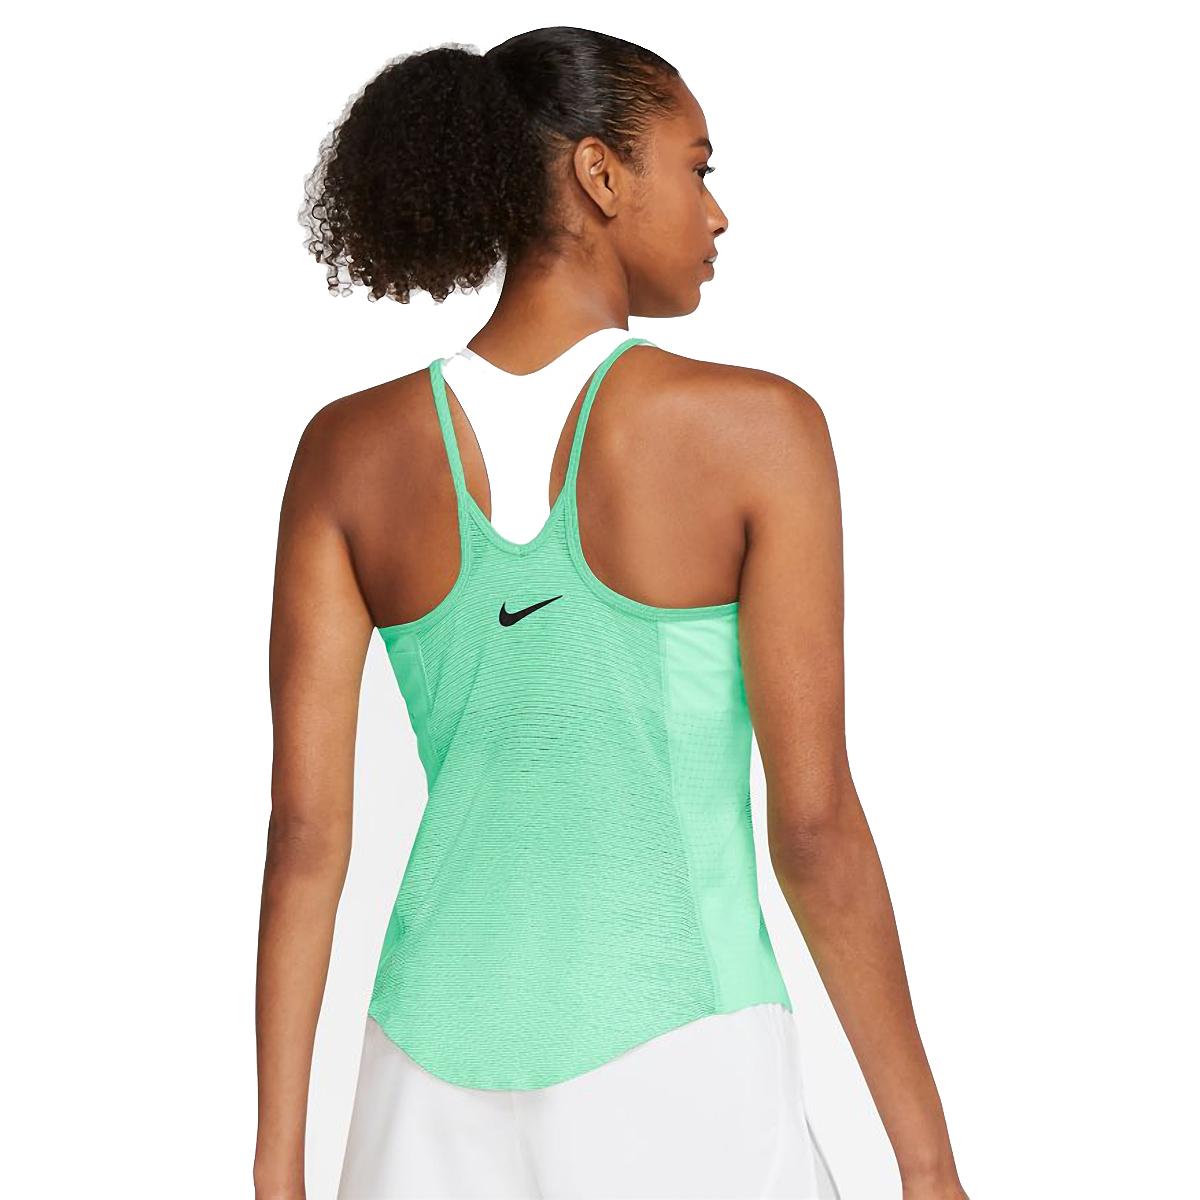 Women's Nike Run Division Engineered Running Tank - Color: Green Glow/White/Black - Size: S, Green Glow/White/Black, large, image 2